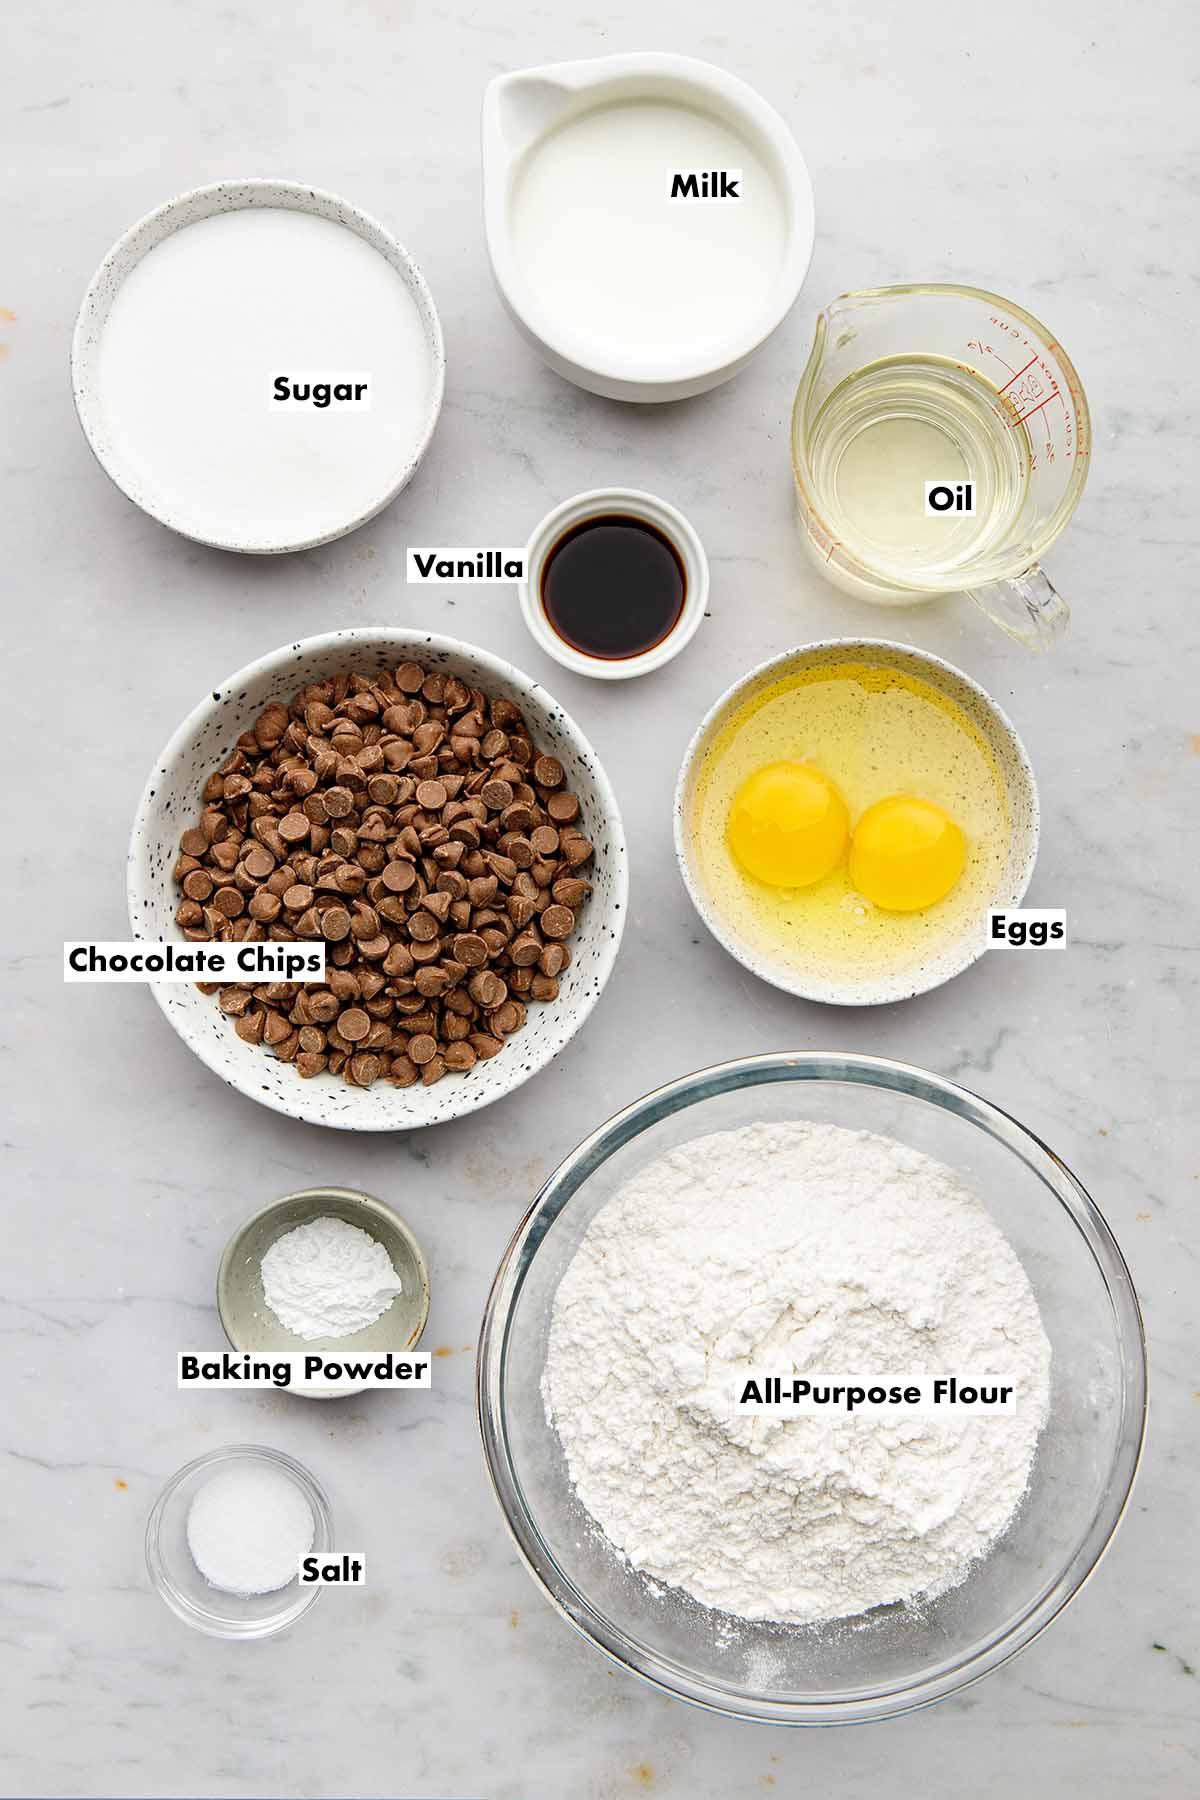 Ingredients to make a chocolate chip sheet cake.